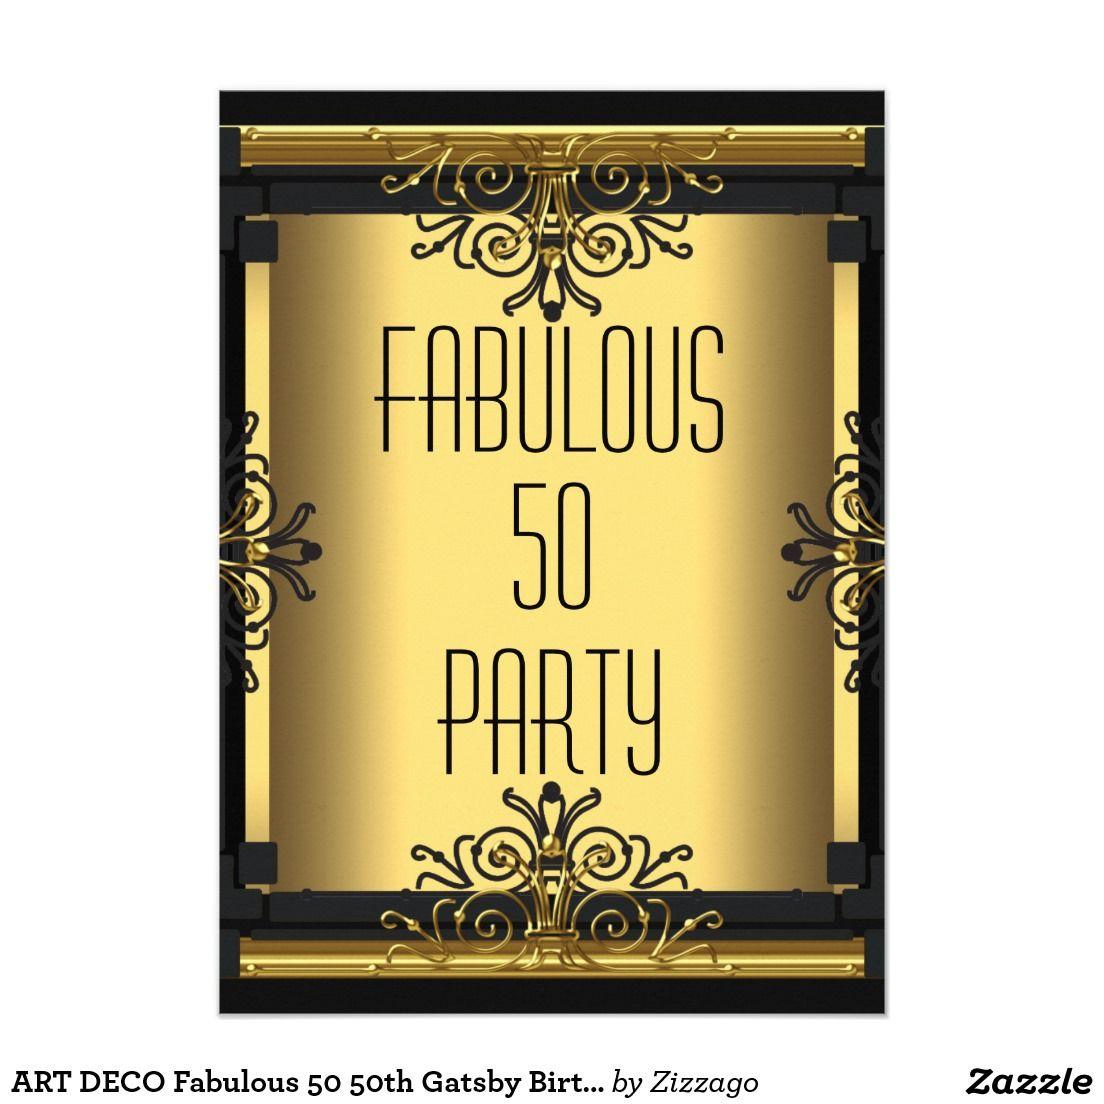 ART DECO Fabulous 50 50th Gatsby Birthday Party 4.5x6.25